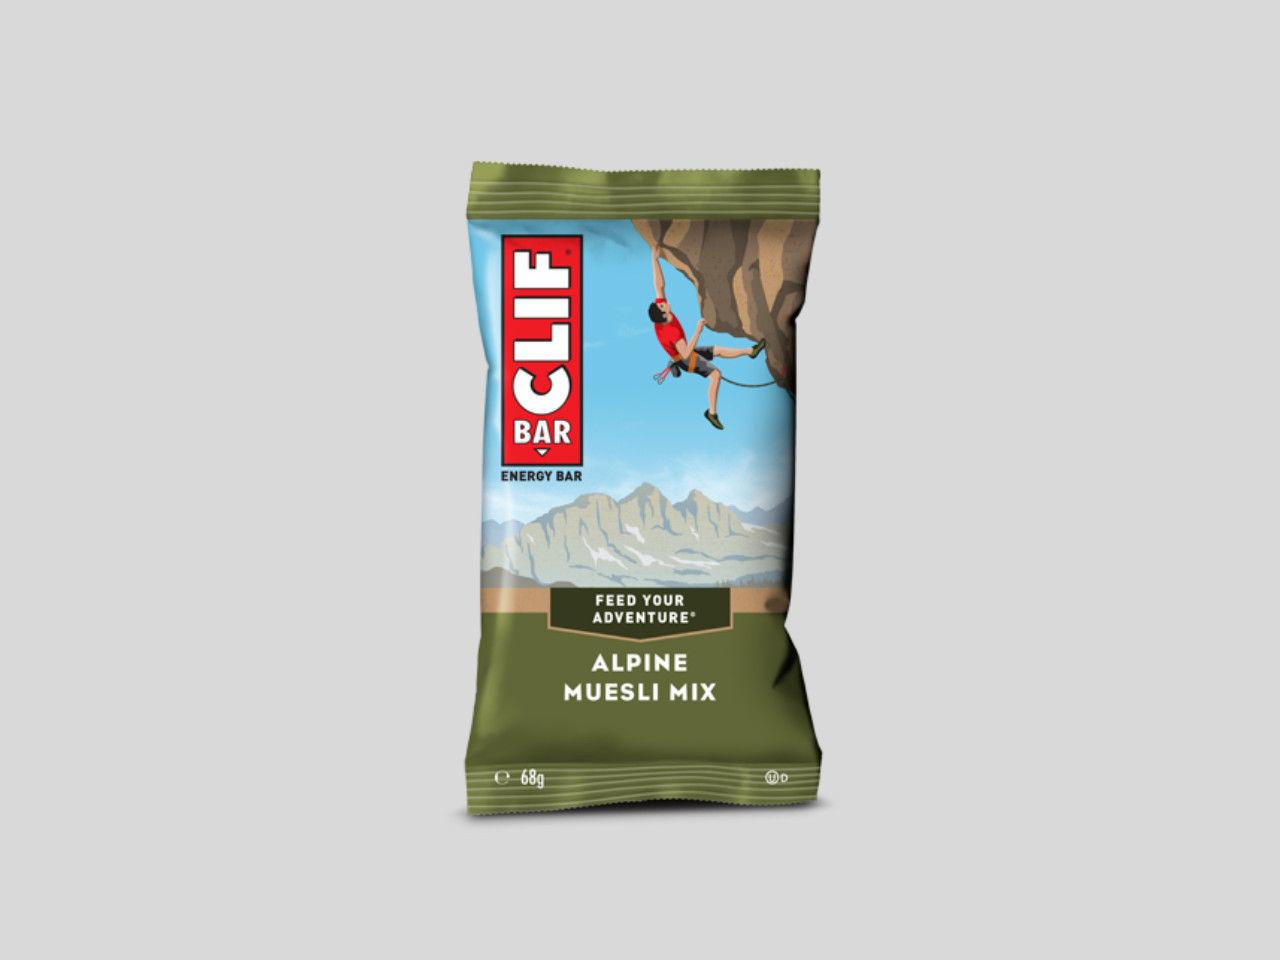 ClifBar energibar 1x68gr - Alpine Muesli Mix